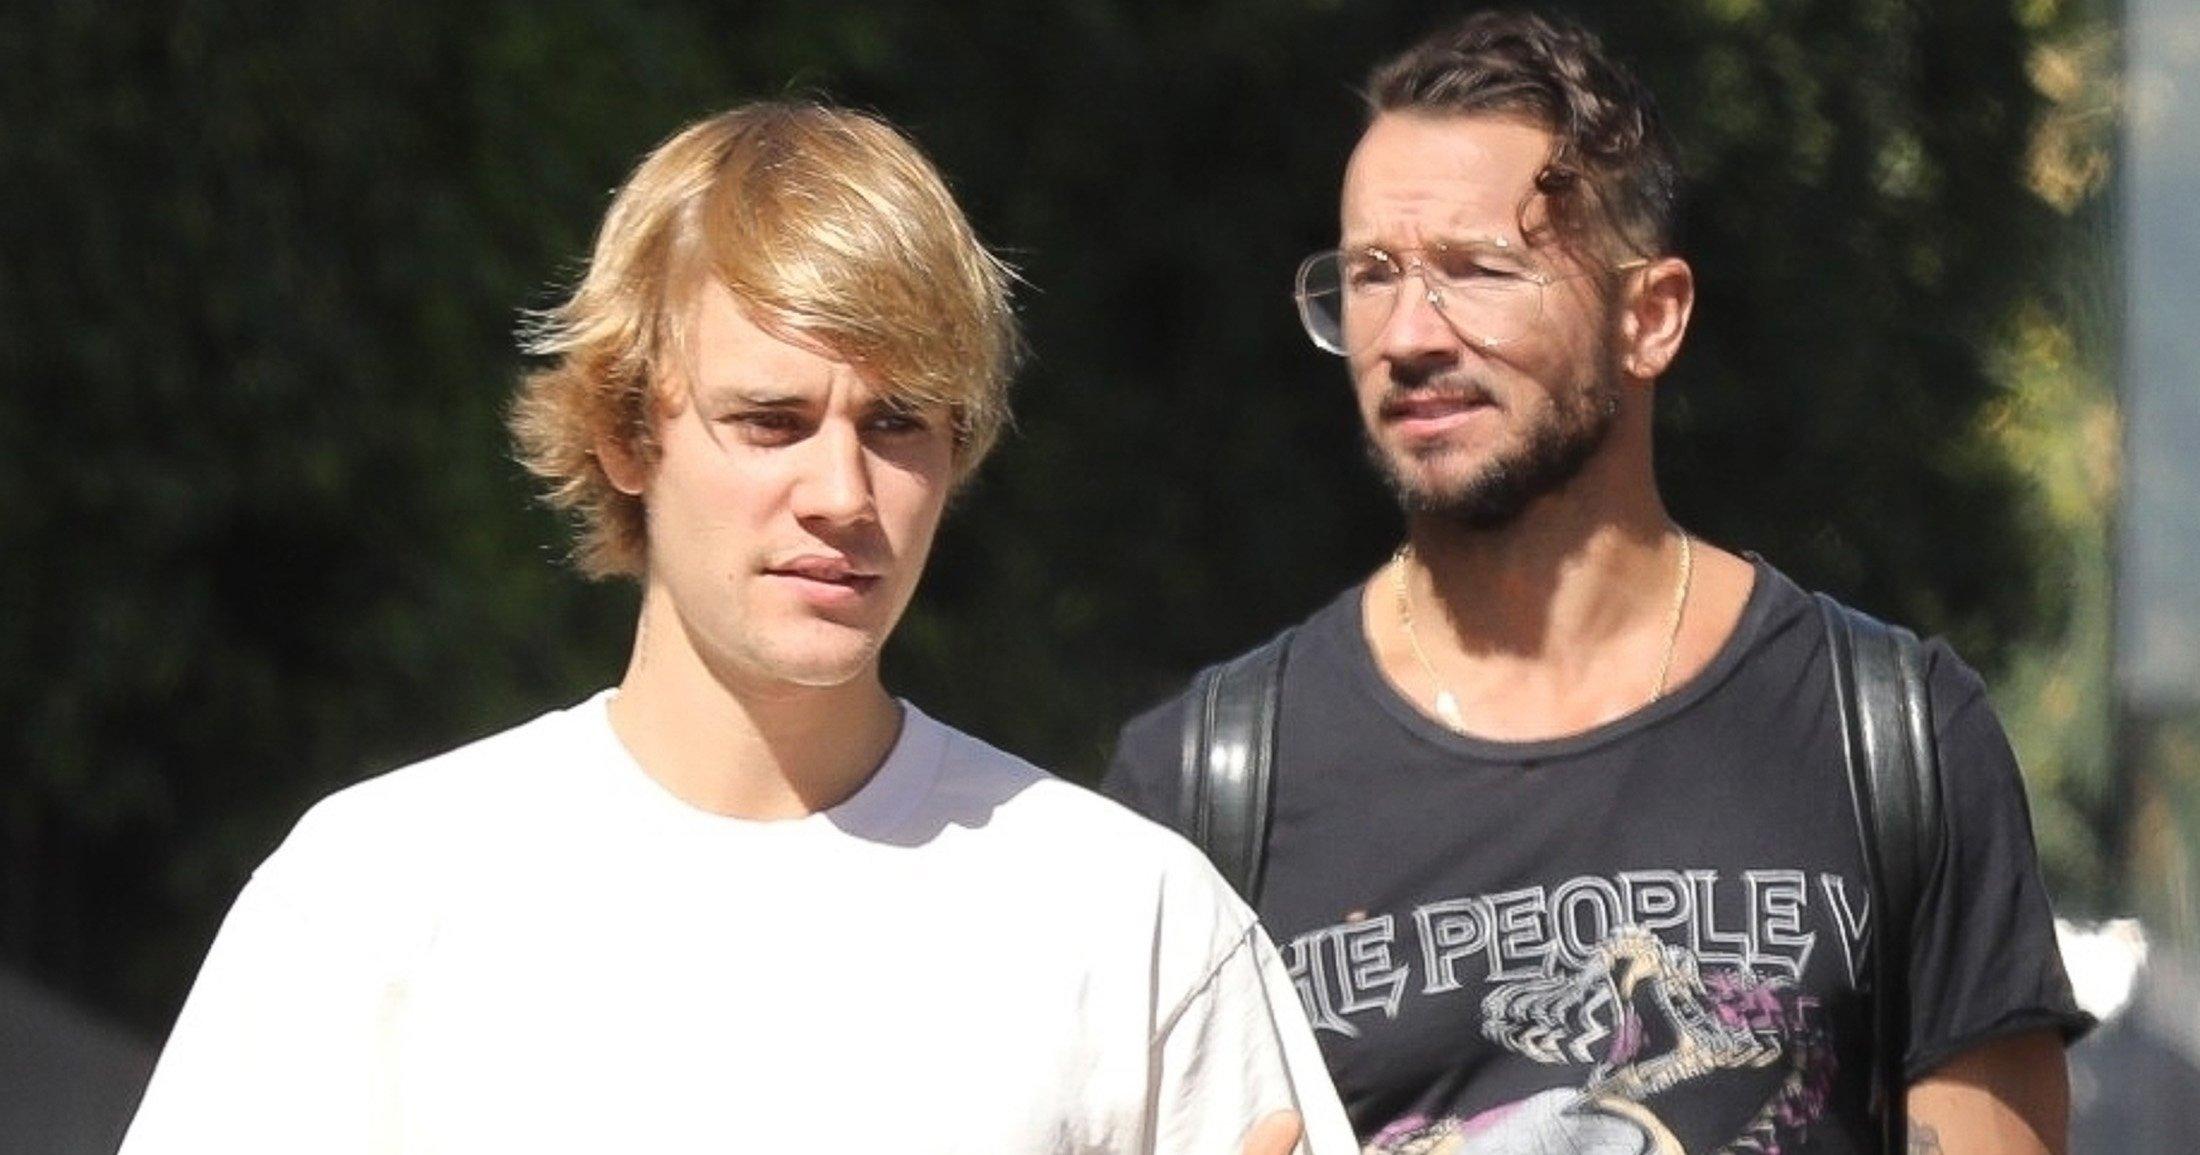 Justin Bieber seeks comfort from church mentor as girlfriend Selena Gomez reveals she entered rehab